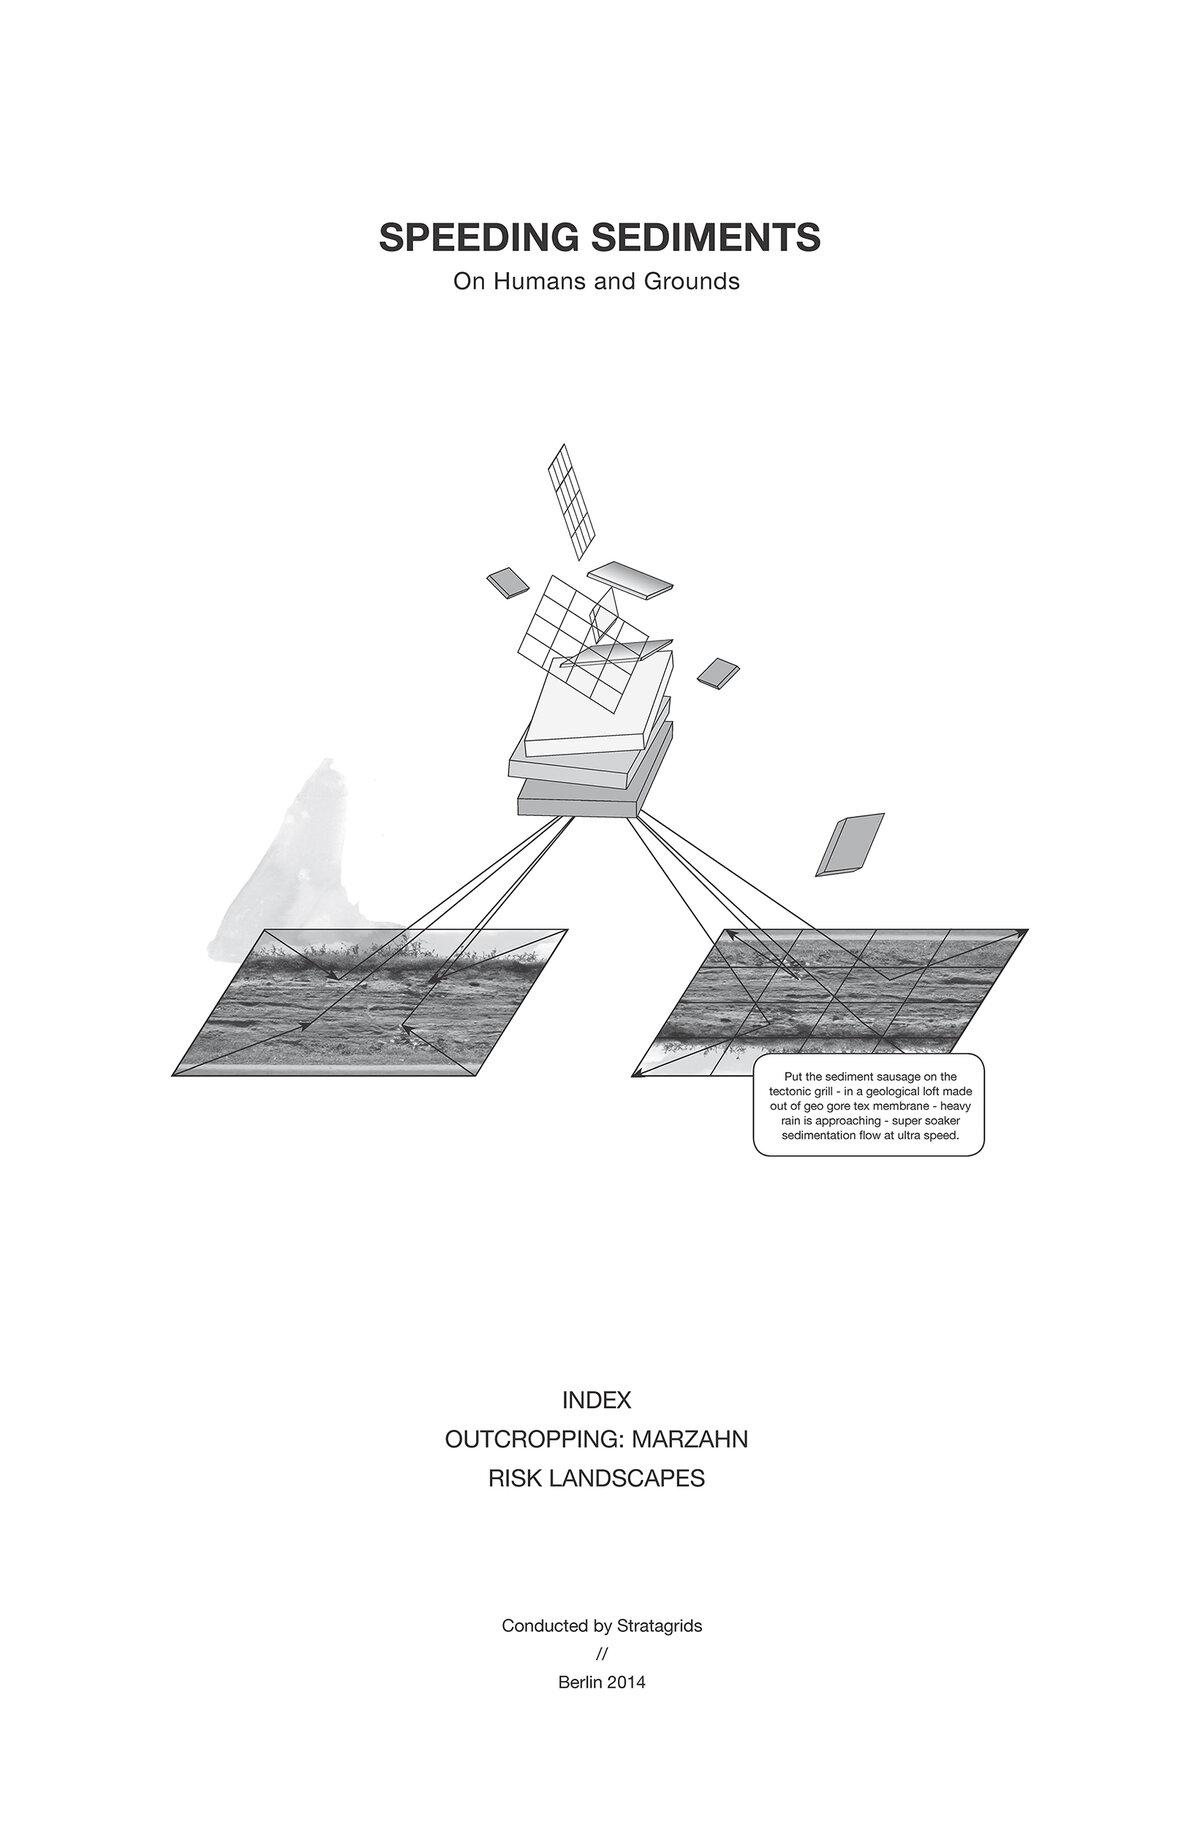 stg_speeding_a4print_page_1-copy-1200x1828-q85